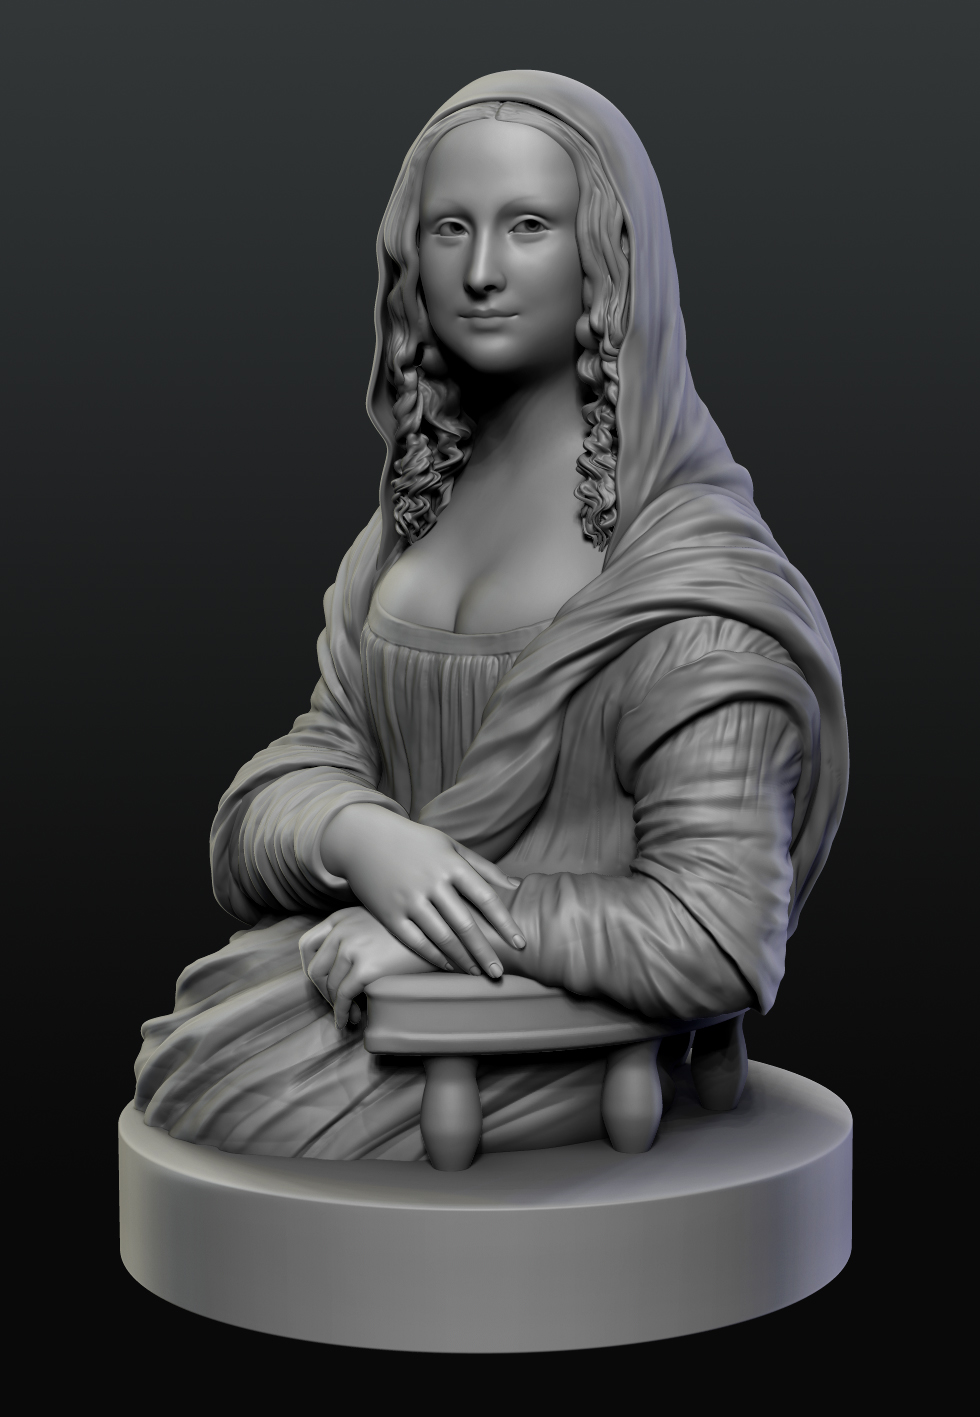 He77ga mona lisa sculpture 1 1c7fc5ff gc38